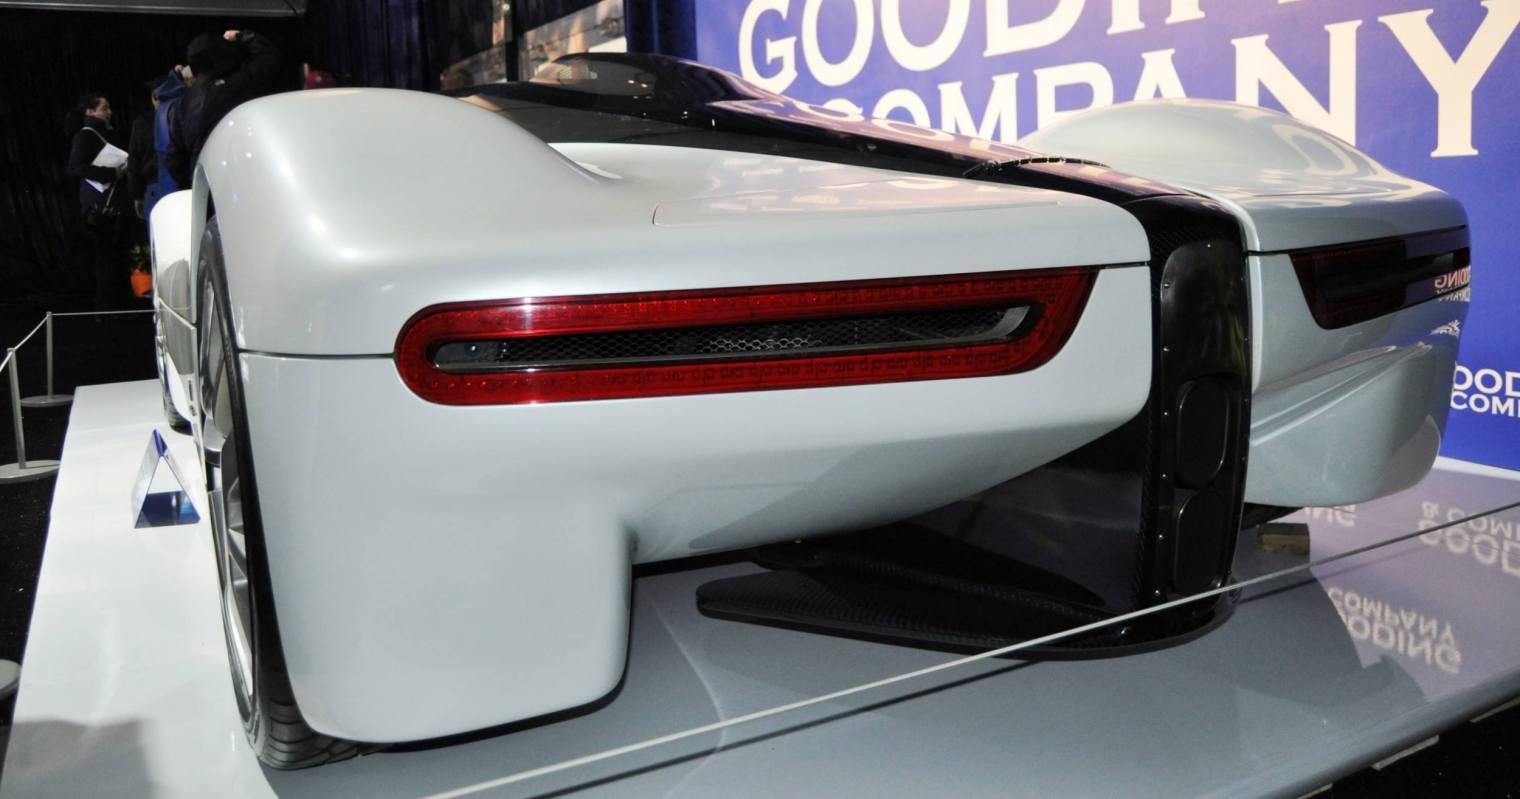 Gooding & Co. -- Amelia Island 2014 Gallery -- 2005 Maserati Birdcage 75th Concept 10